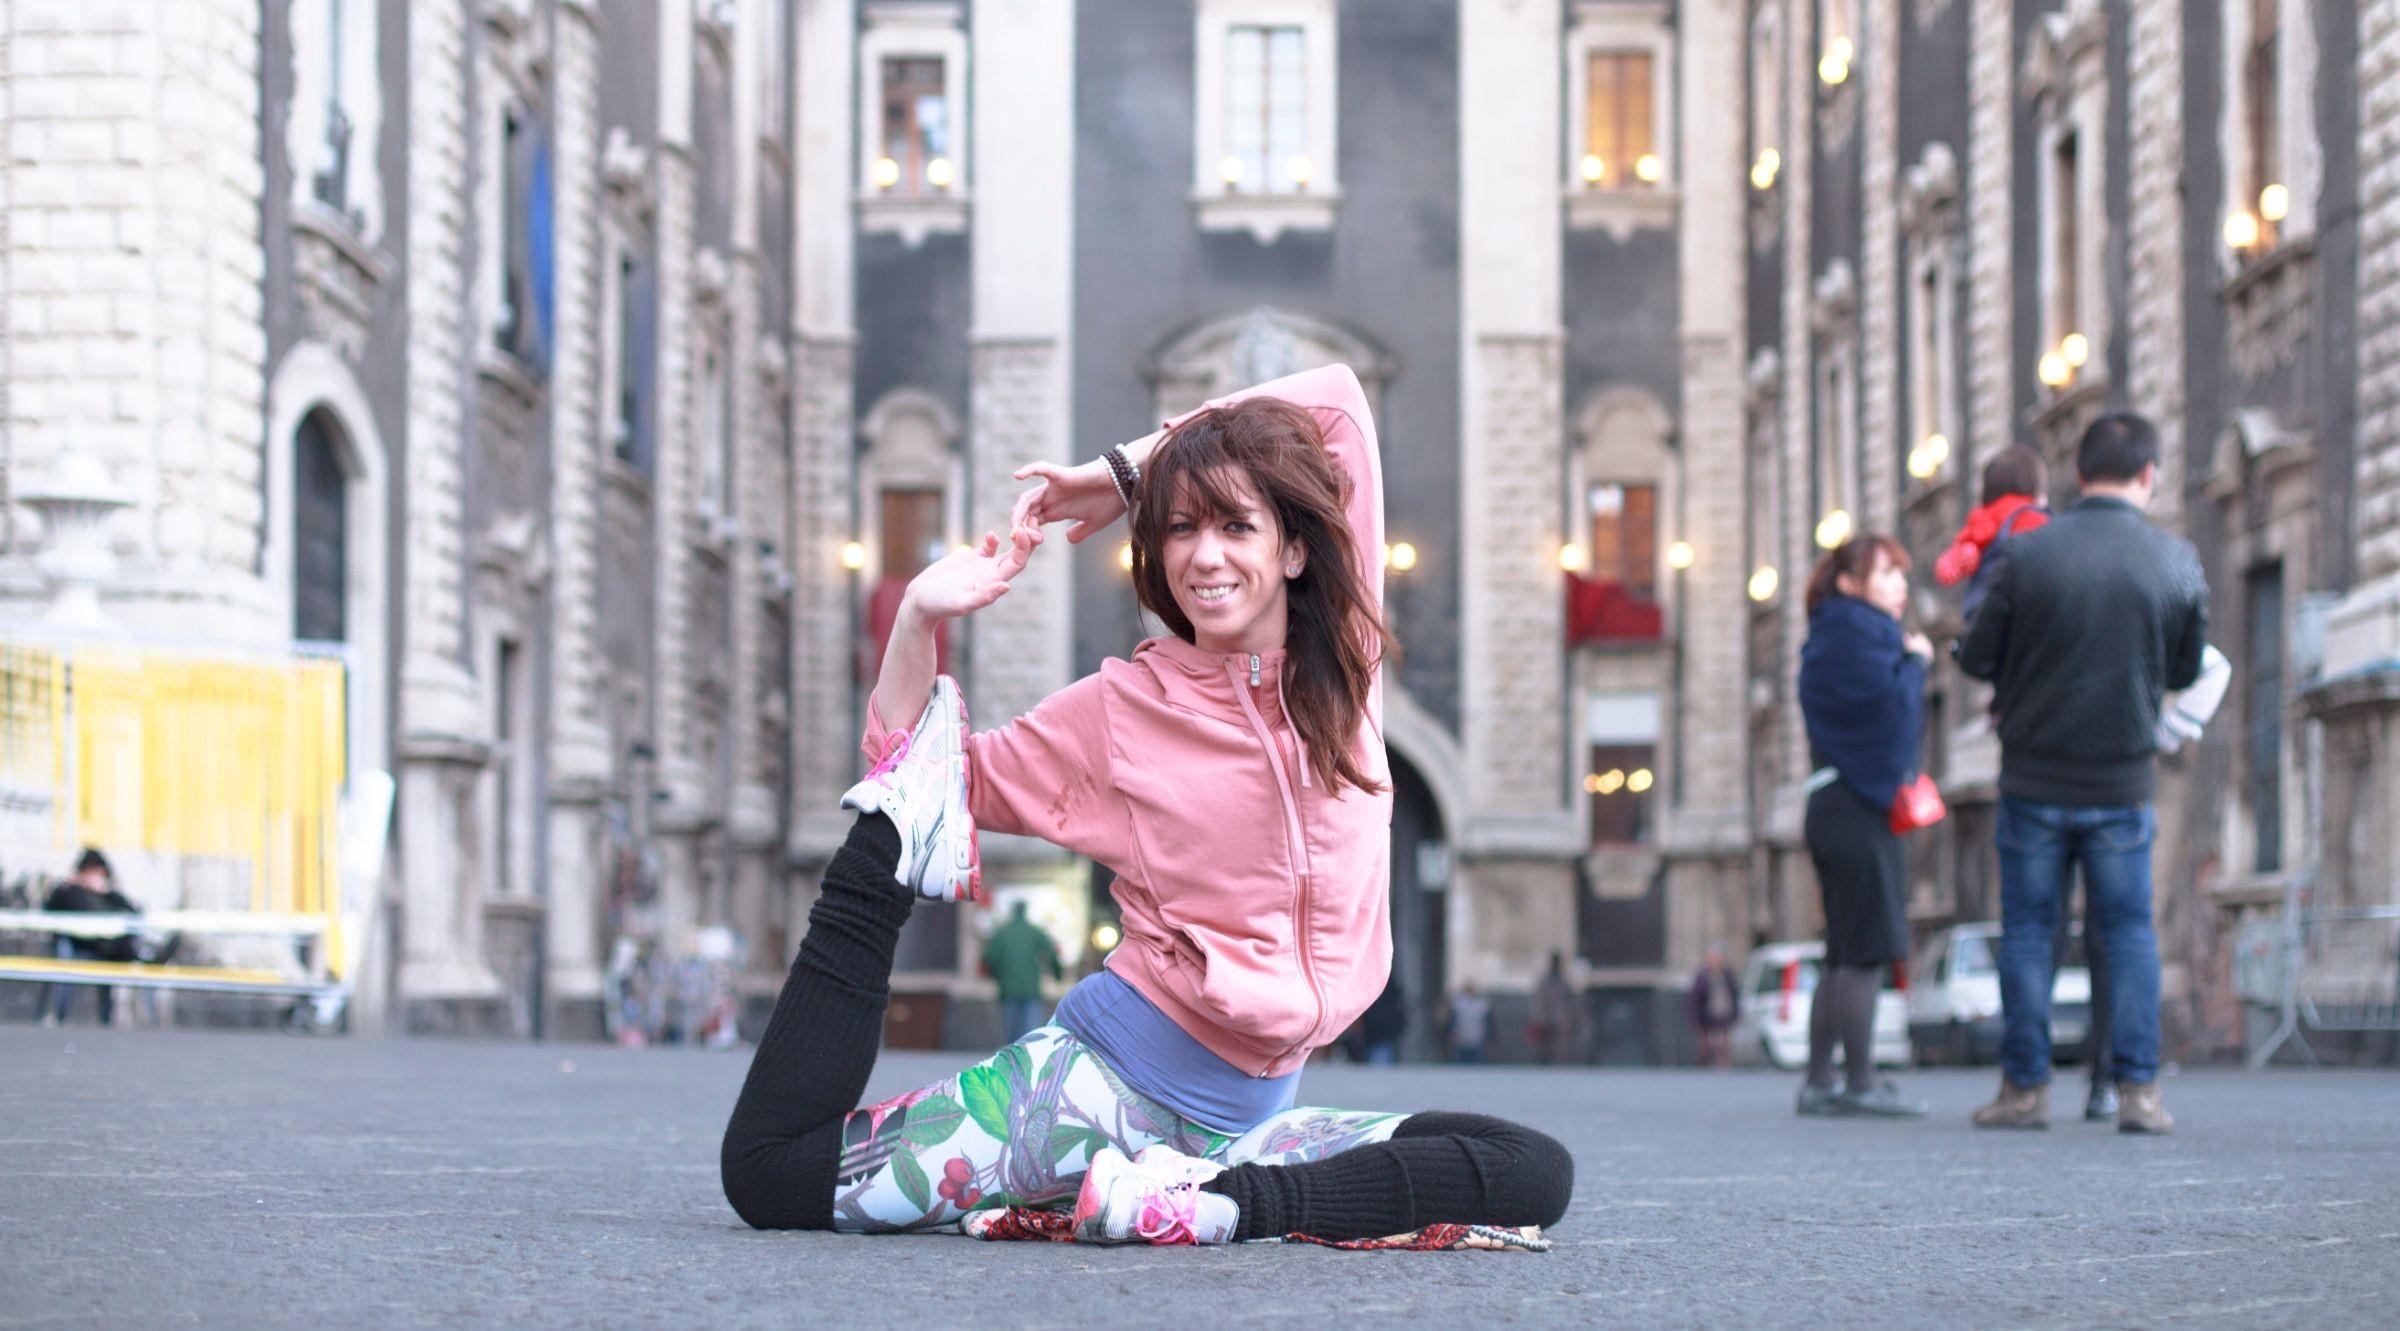 Alessia La Rosa lakshmi home catania sicily italy elad itzkin yoga photography